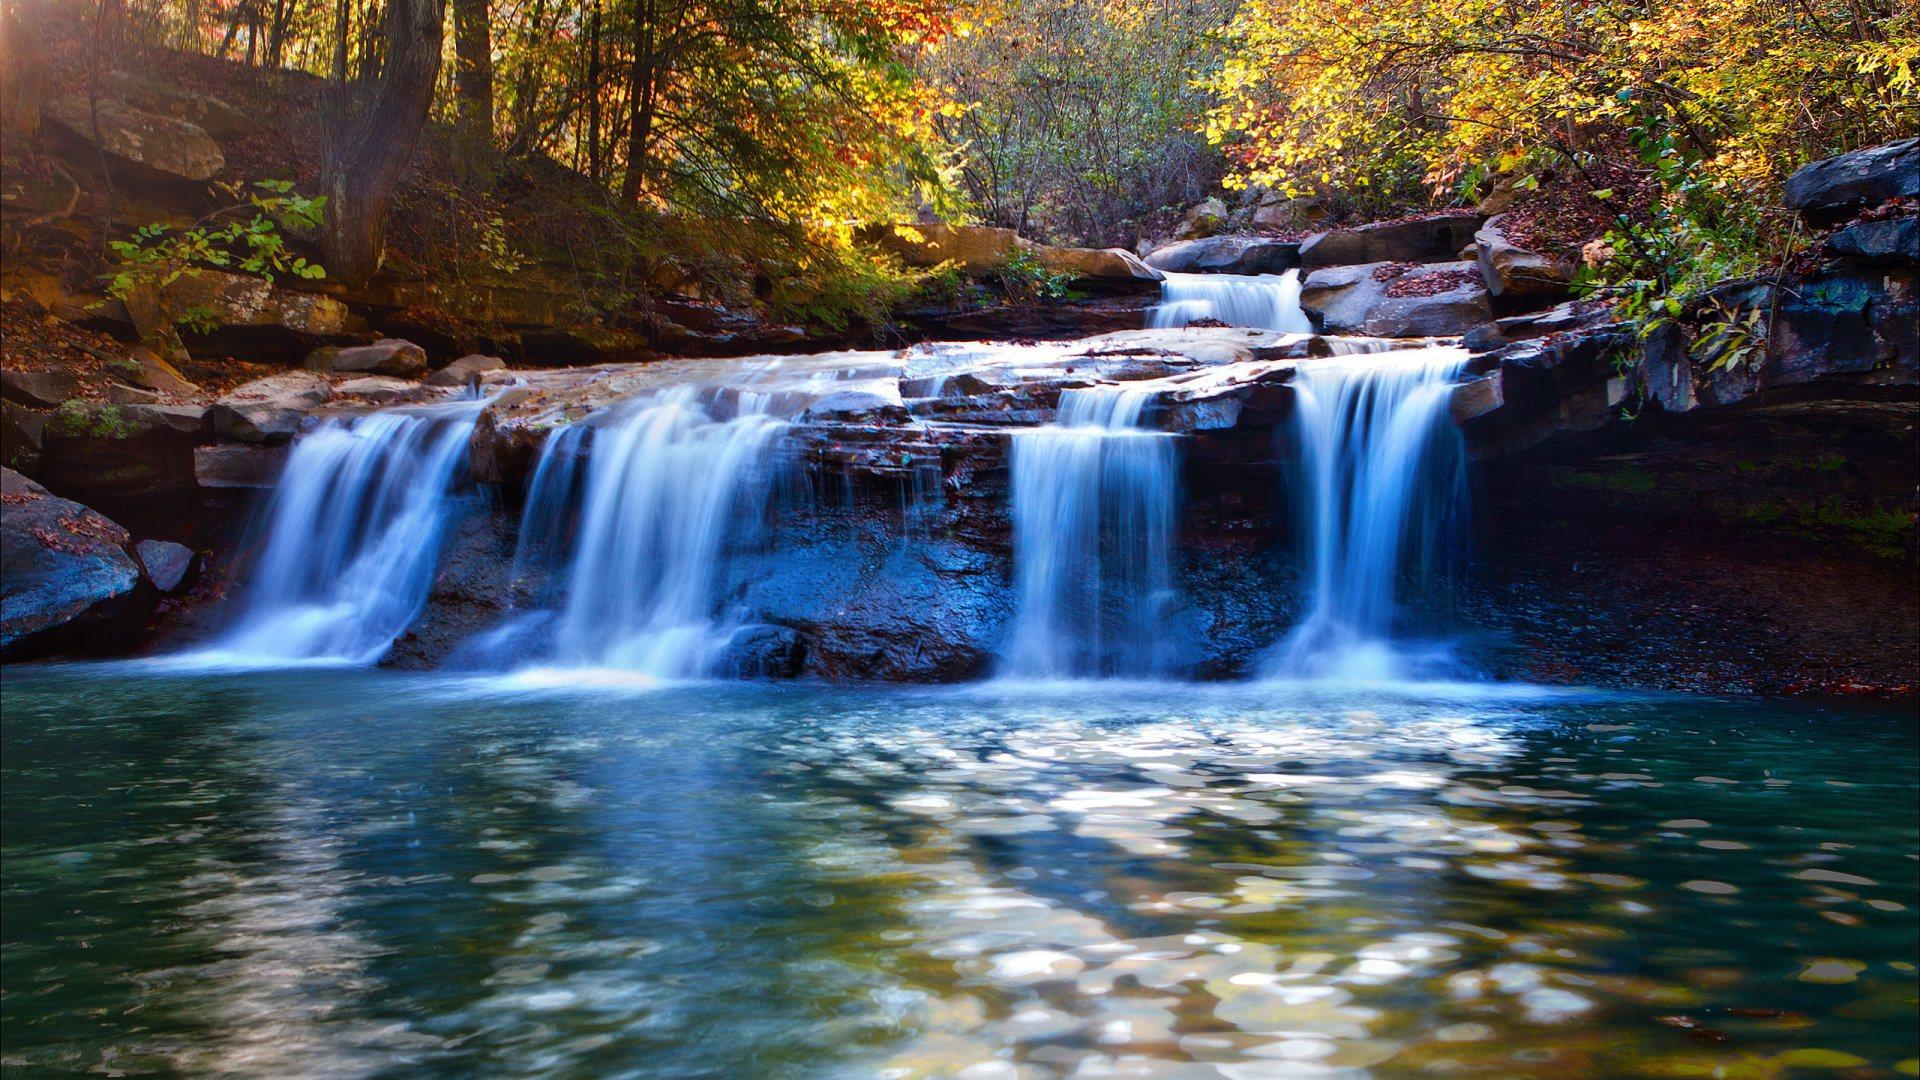 Beautiful Waterfall Photo Hd Wallpapers Free Water Fall Wallpaper For Desktop 1920x1080 Wallpaper Teahub Io